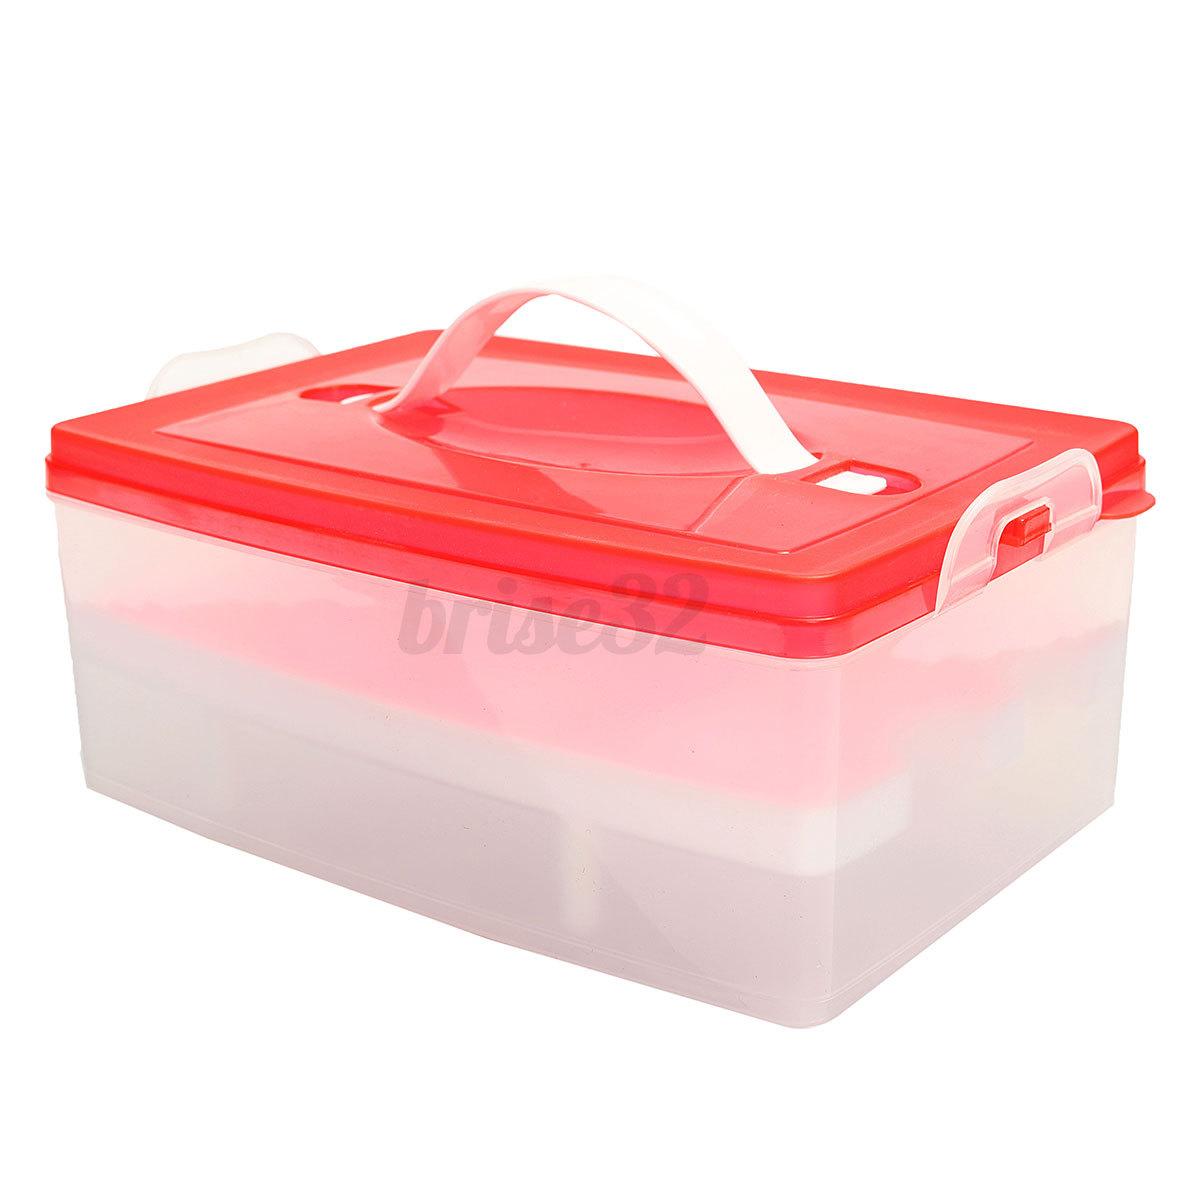 Plastic Double Layer Kitchen Storage Organizer Egg Holder Keeper Container Box Ebay